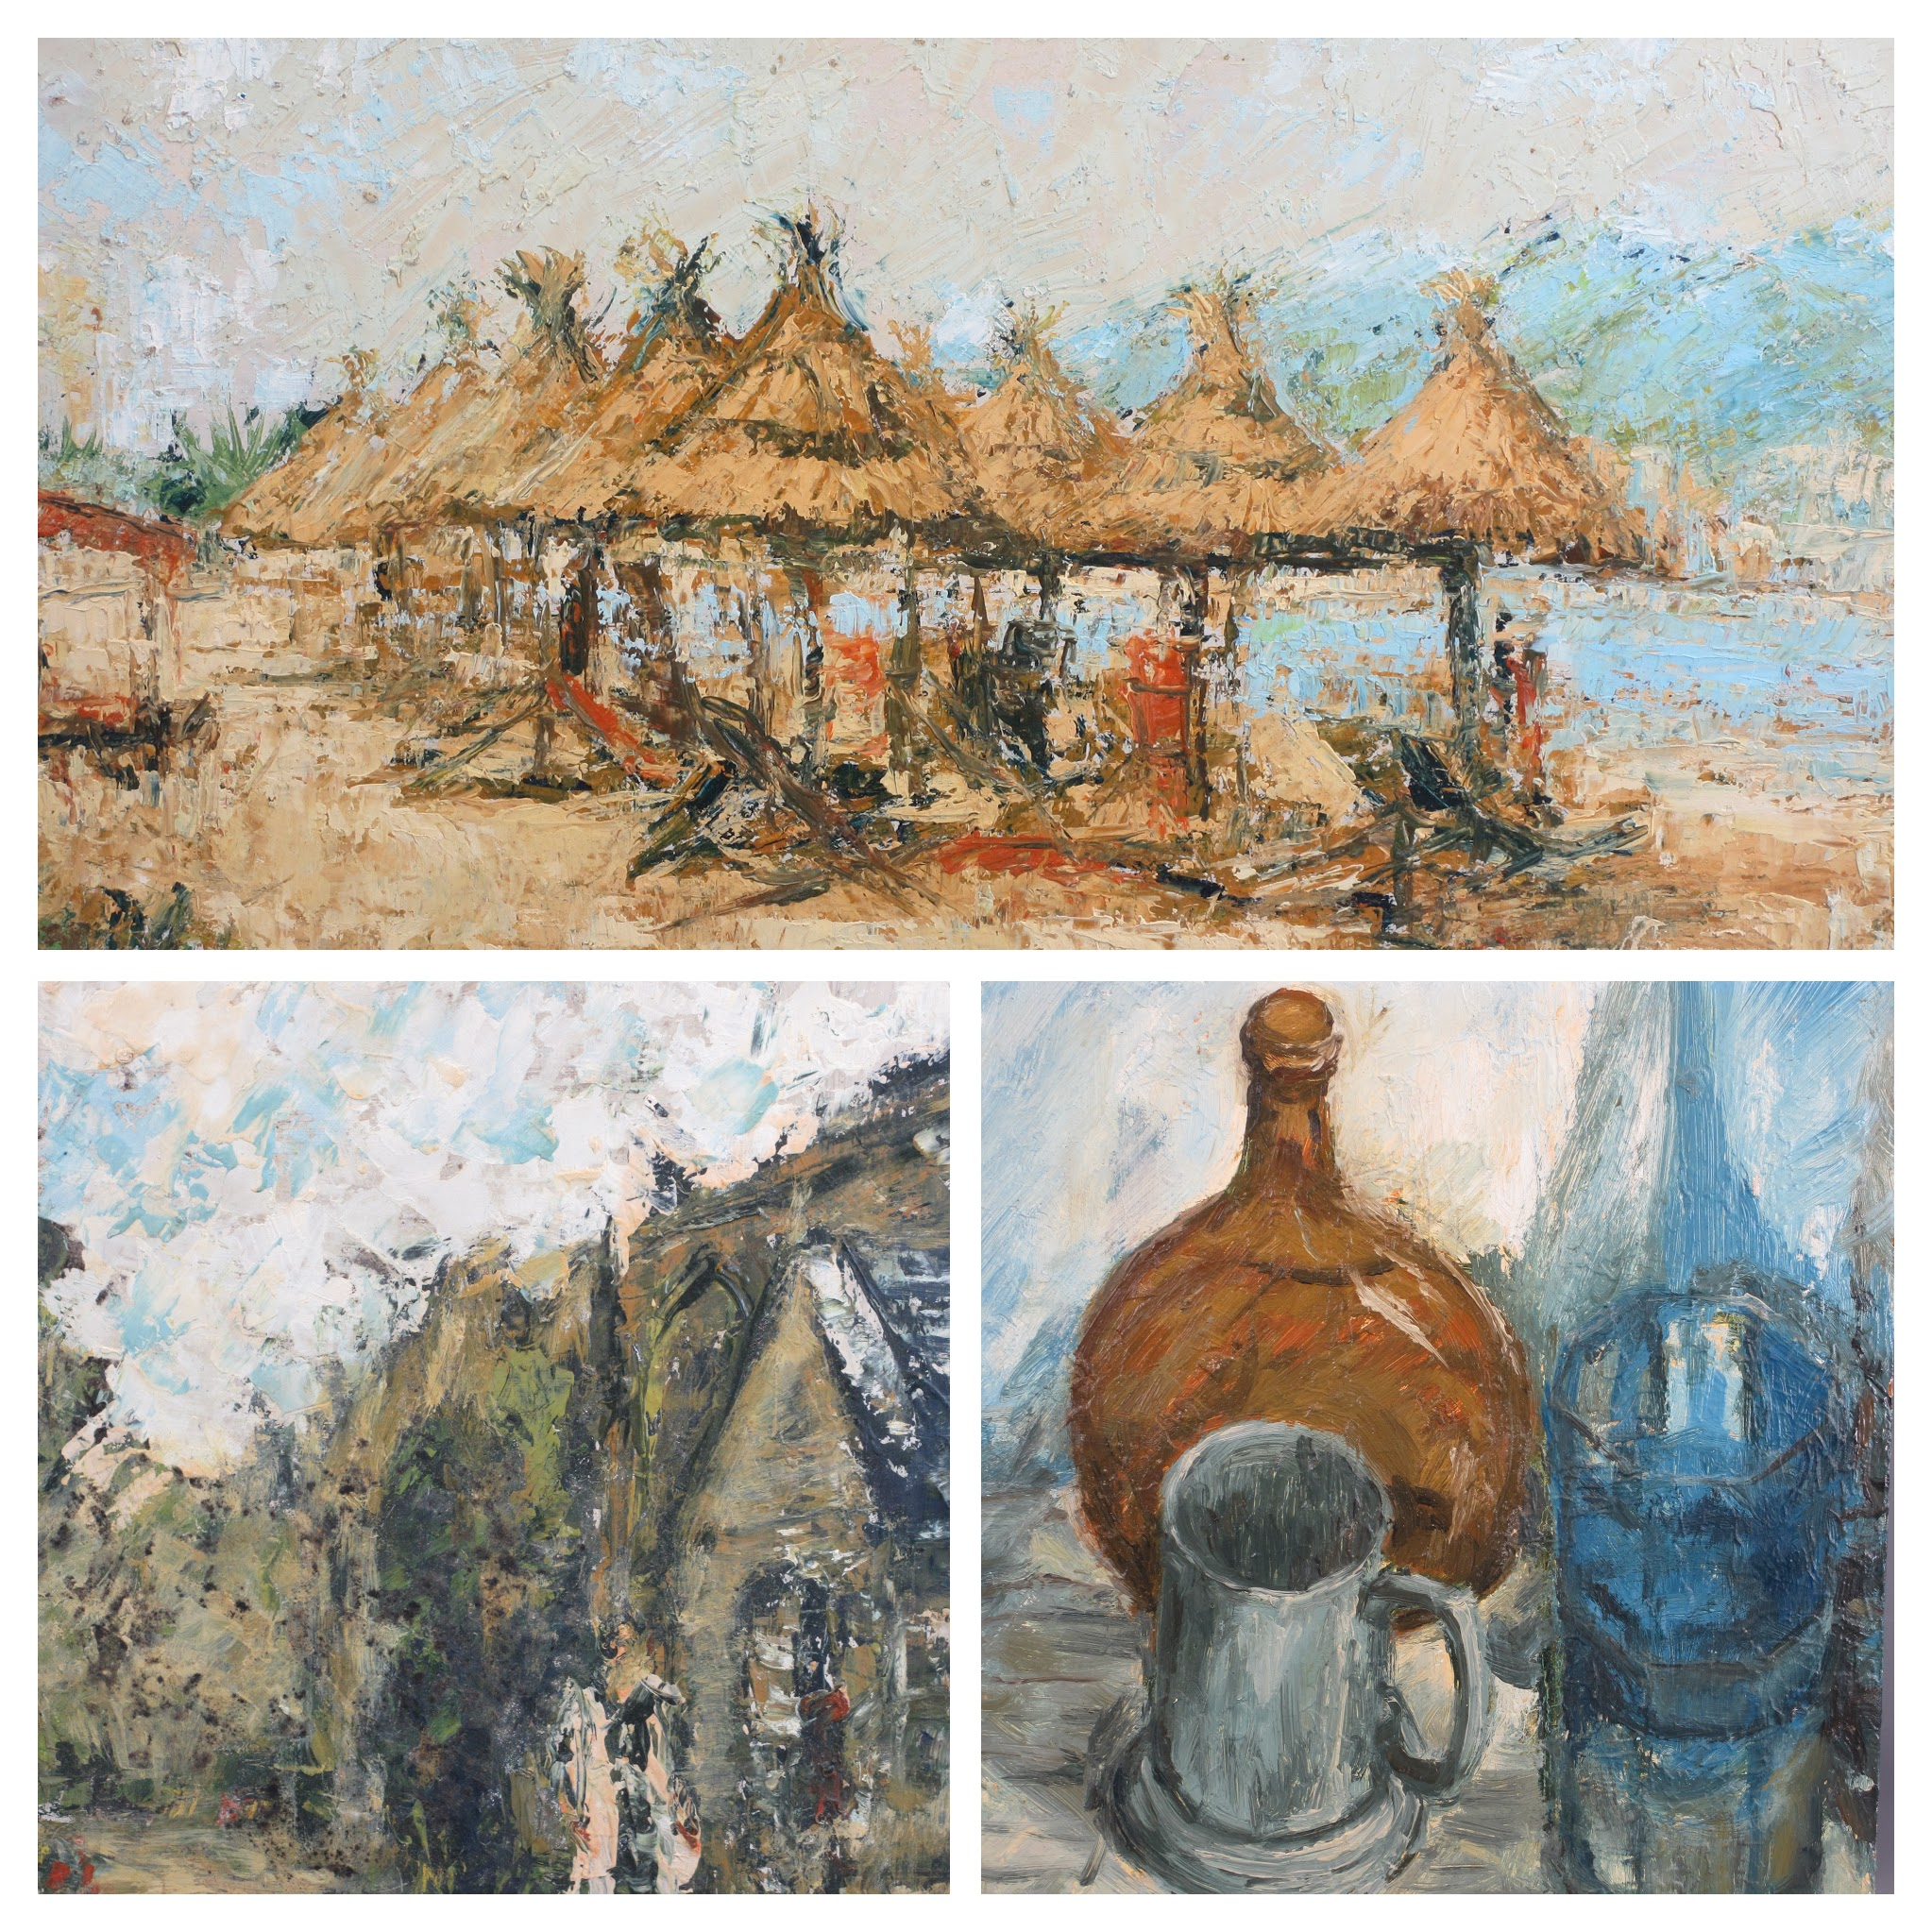 ALAN MACKAY acrylic on board - tropical beach scene with straw umbrellas, Impressionistic painting